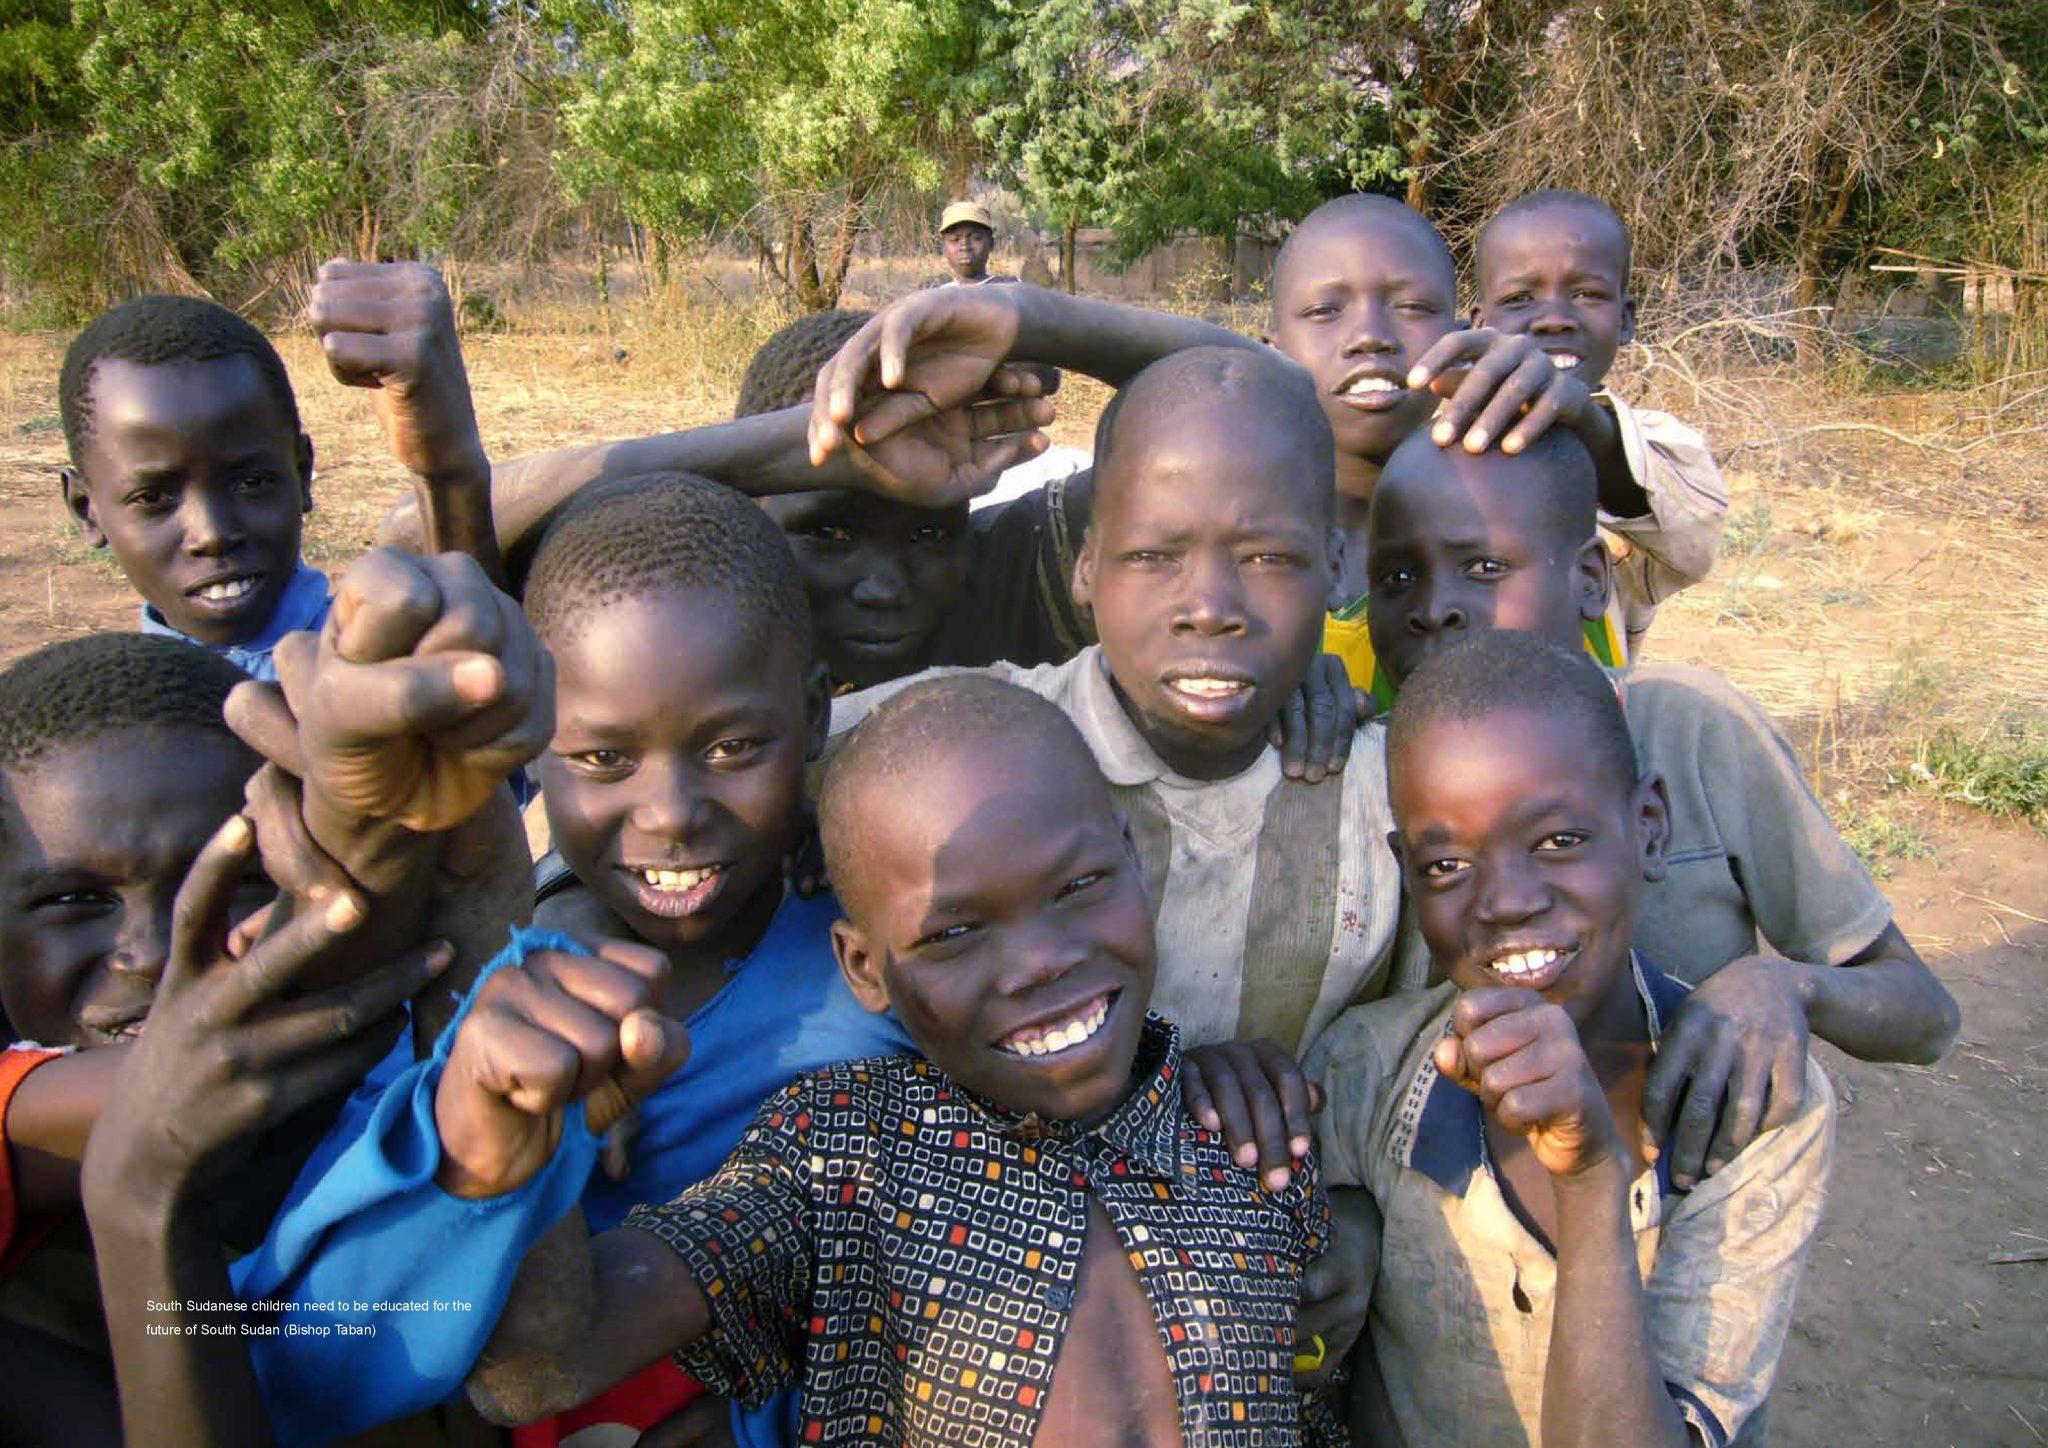 Sudan, Nigeria: Jihad against Black Christians?